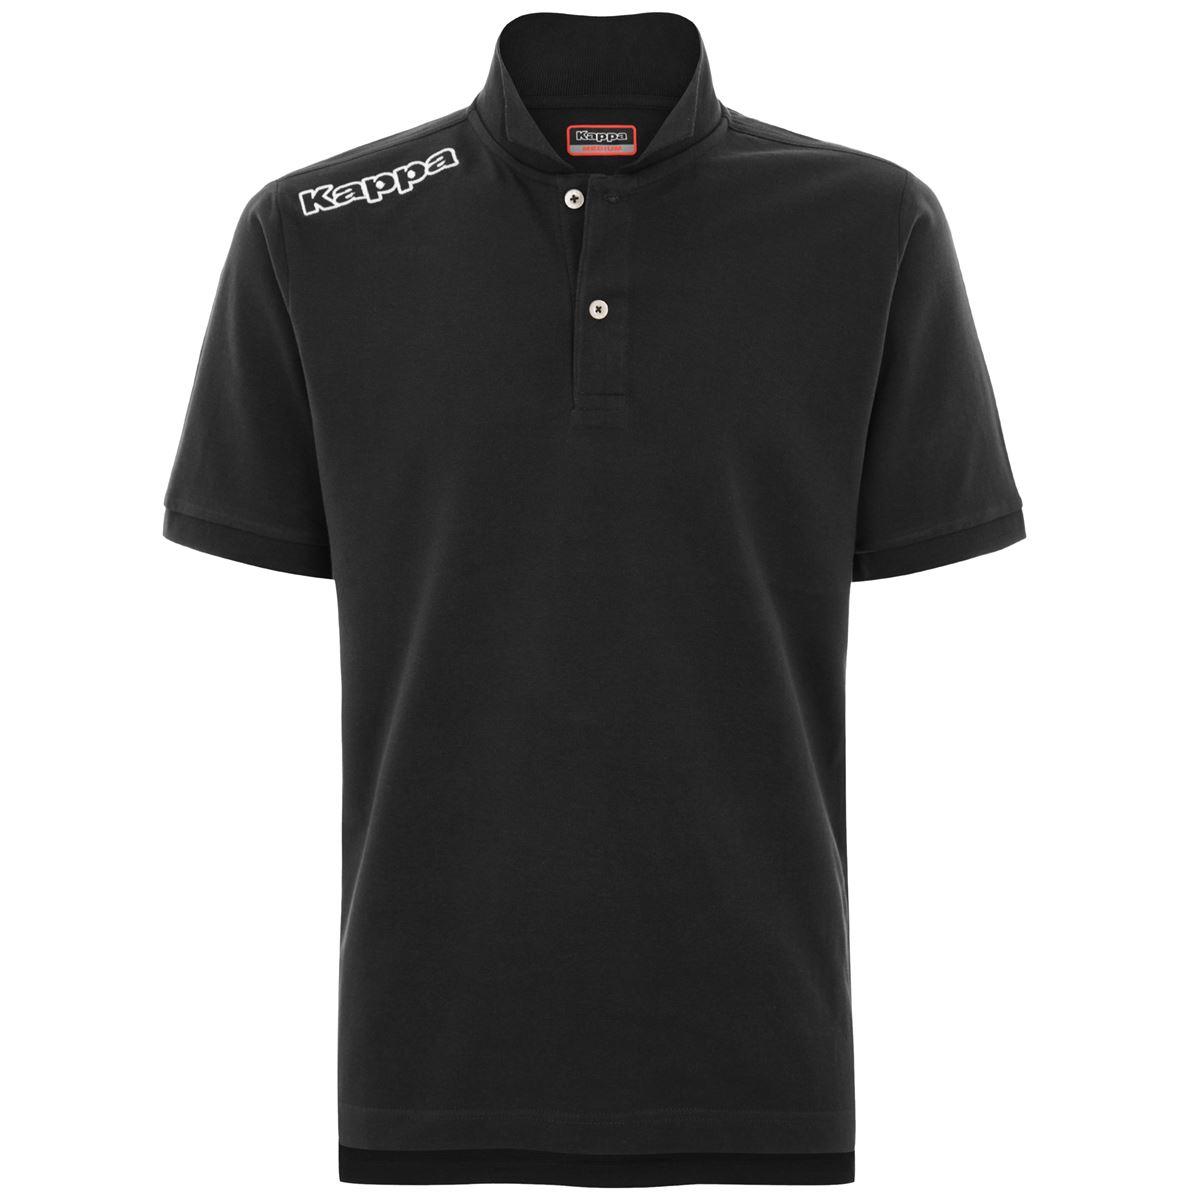 Kappa Polo Shirts LOGO POLO KAPPA MSS Bambino Tennis sport Polo